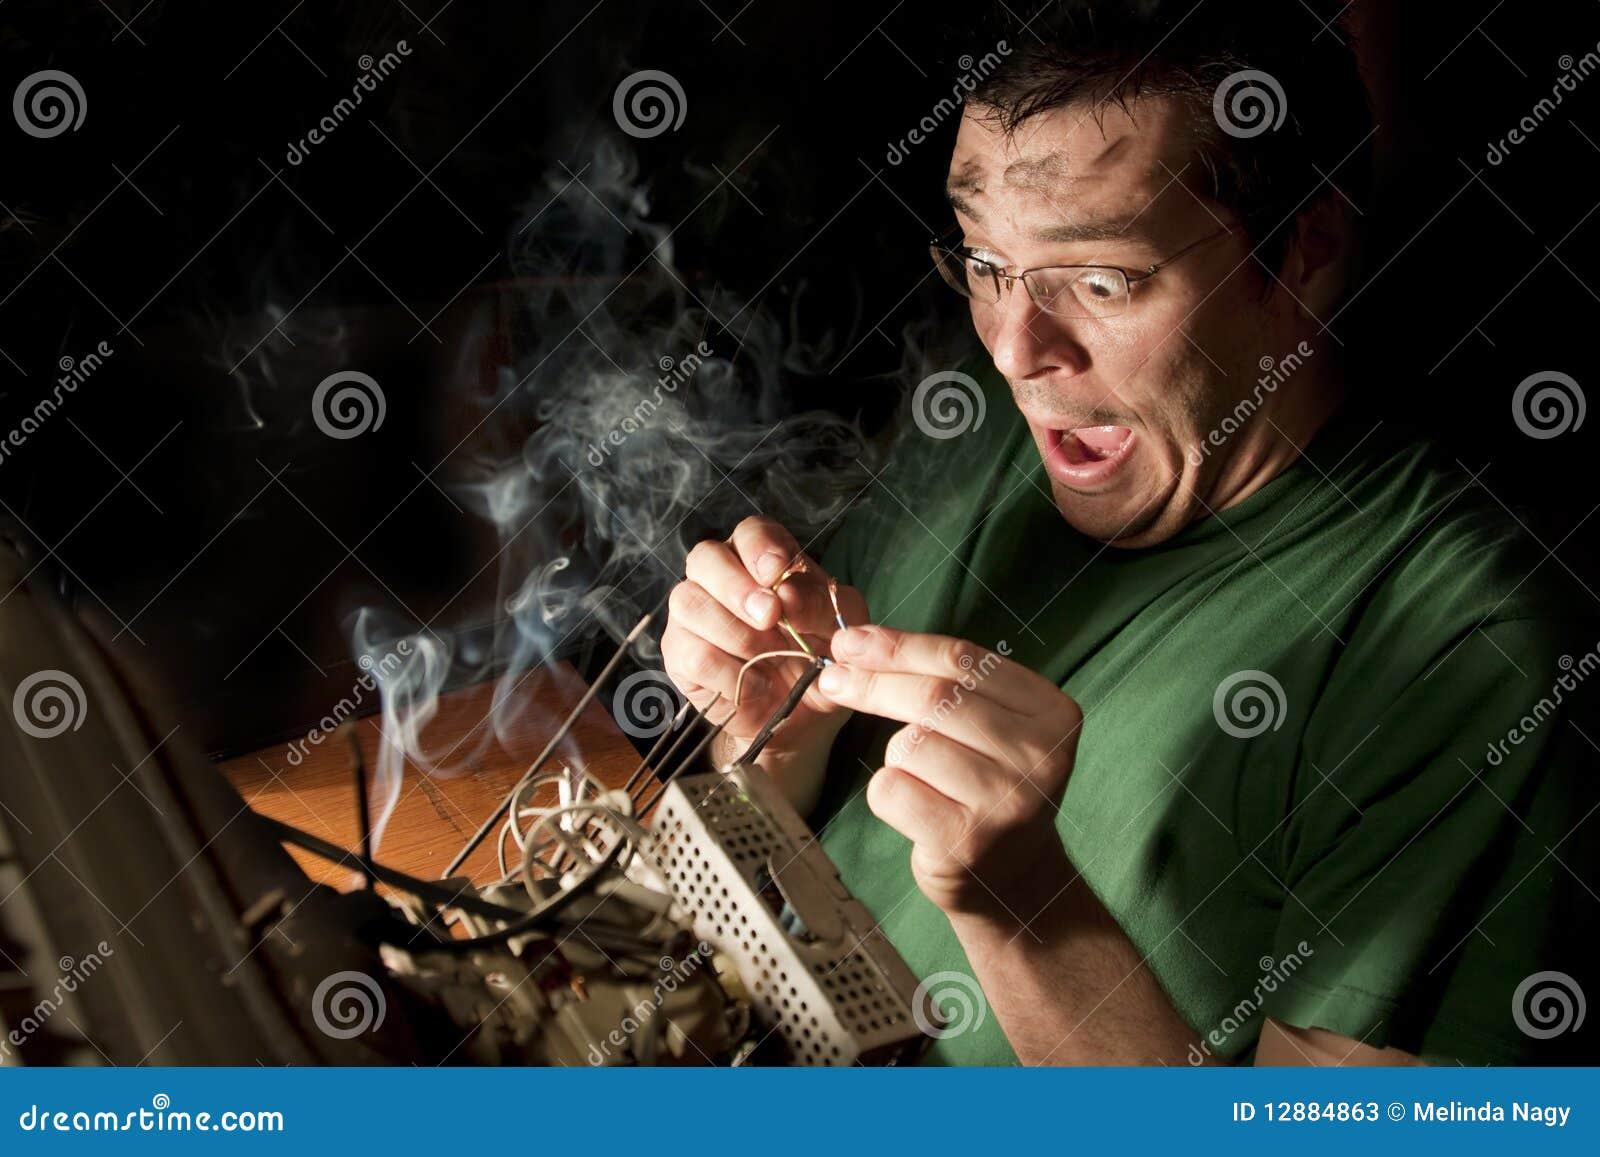 Man Repairing Computer On Fire Stock Photos - Image: 12884863